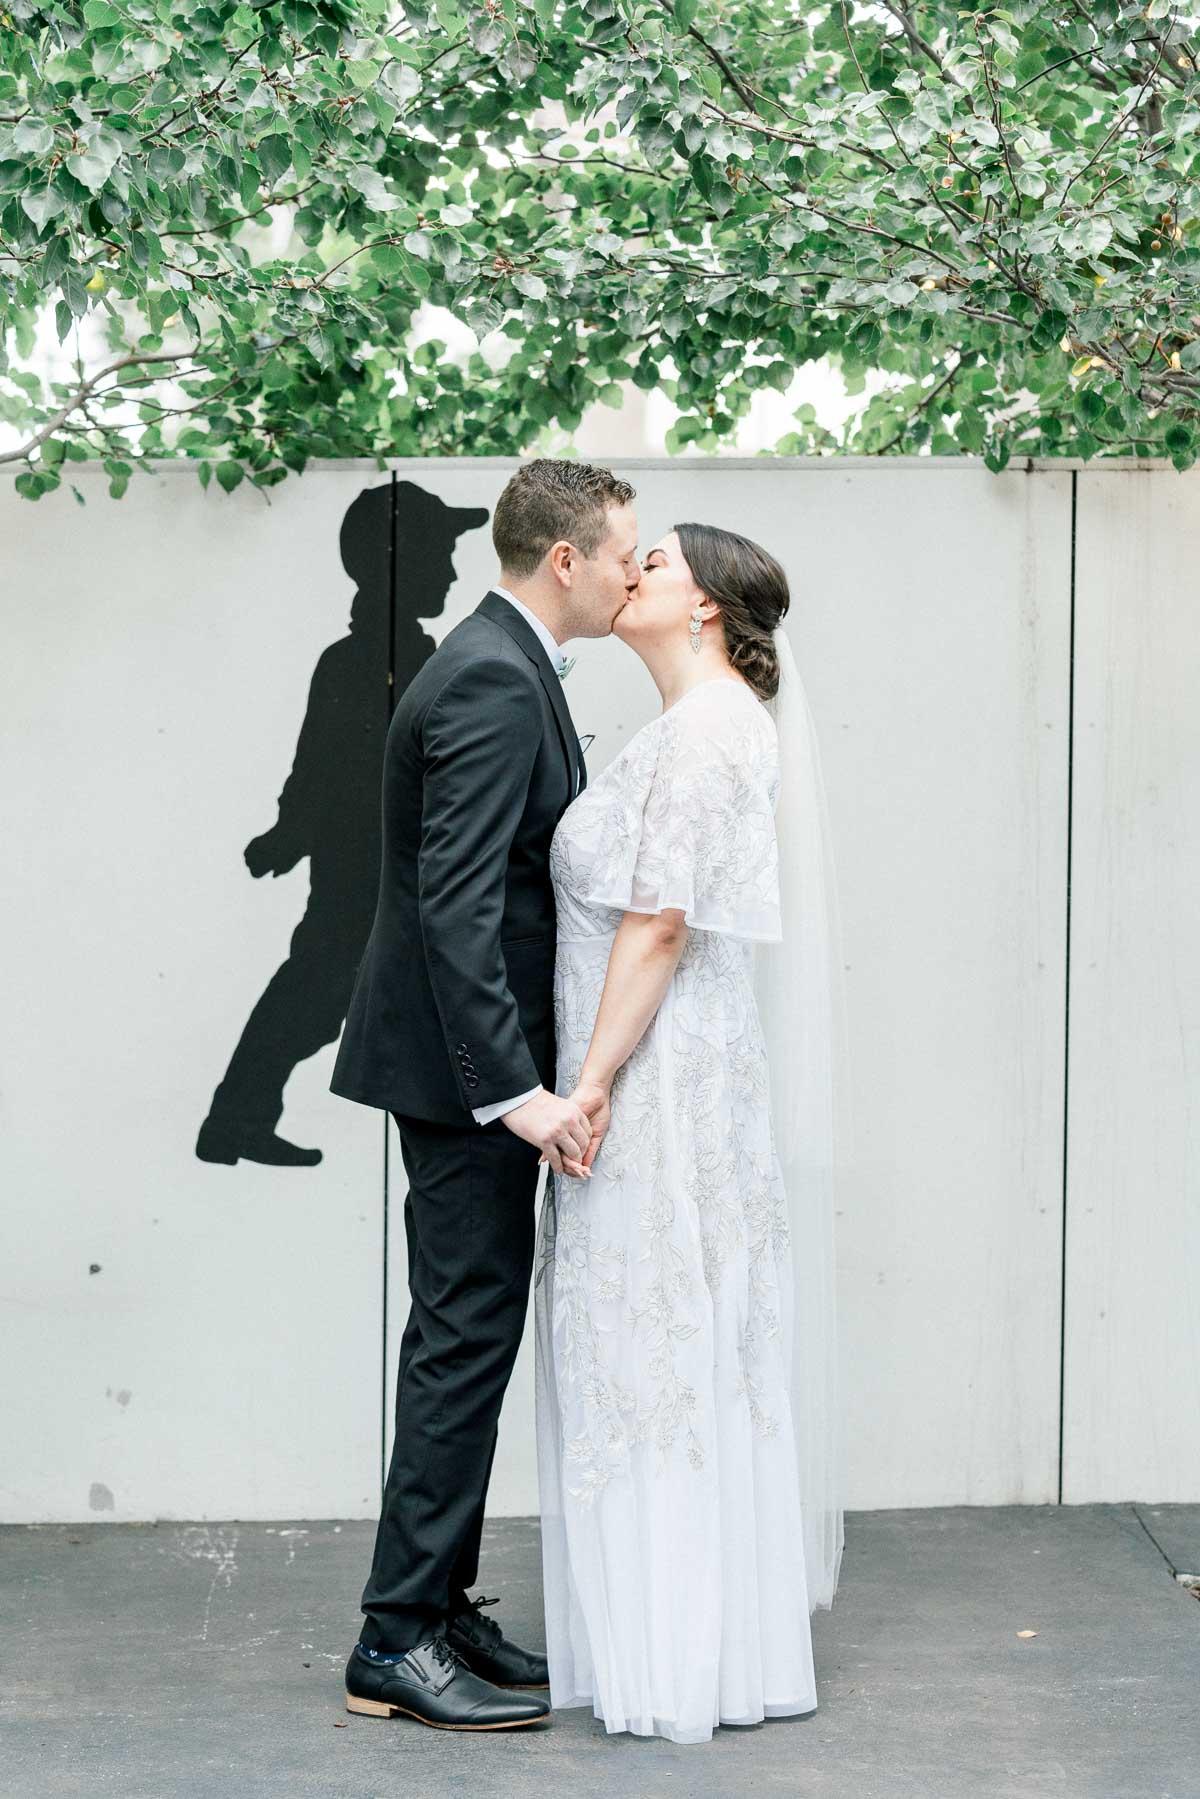 little-henri-cafe-wedding-thornbury-heart+soul-weddings-jane-aaron-05683.jpg